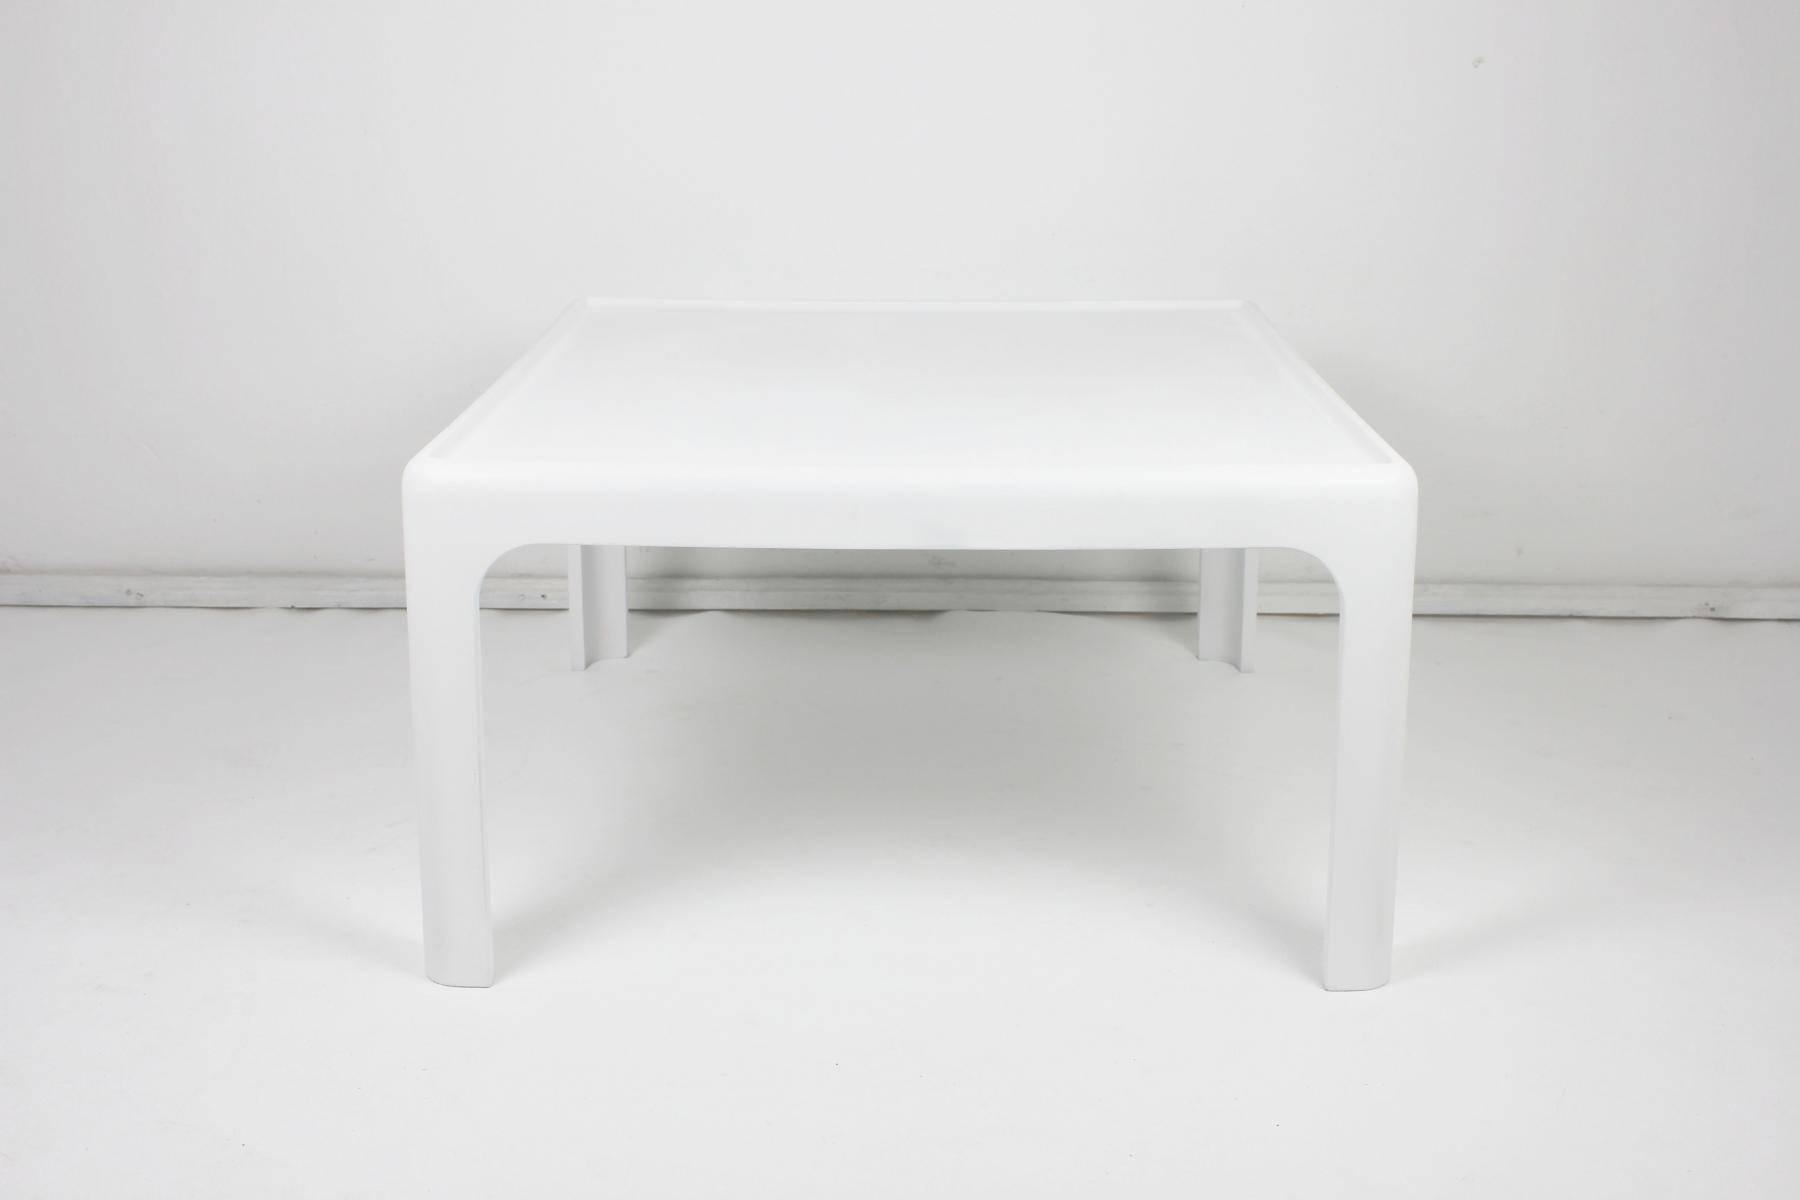 Retro Coffee Table Stools Interior Design